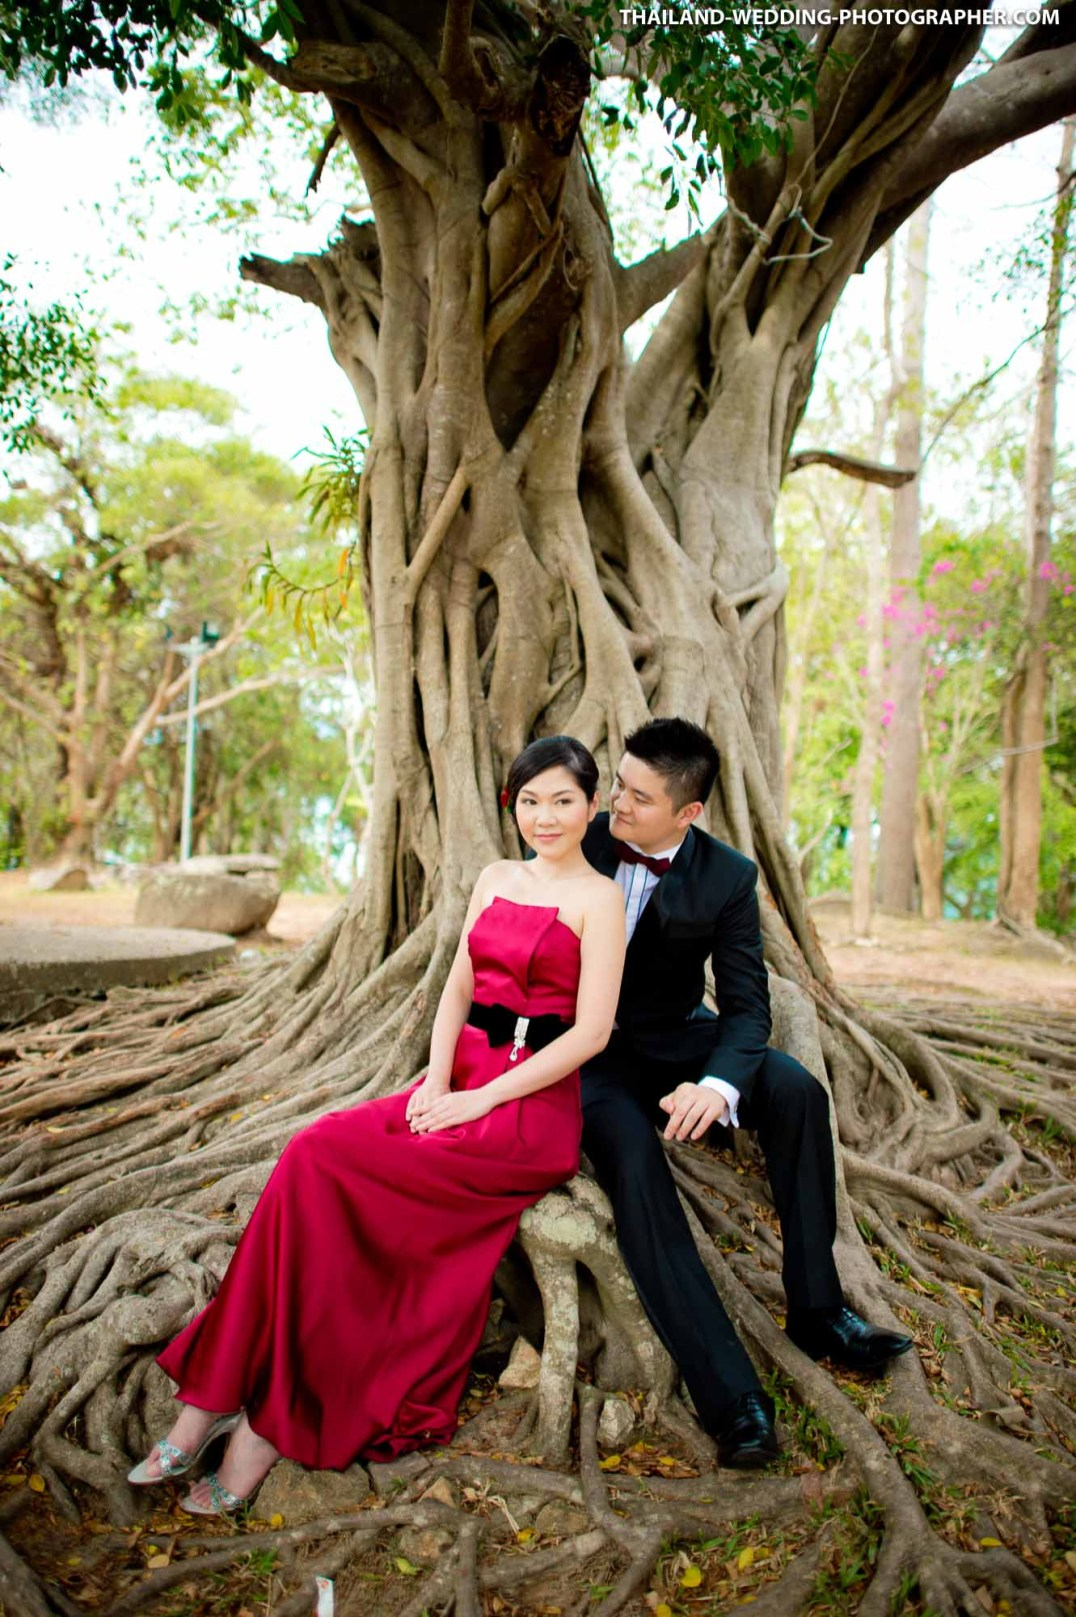 Rang Hill Phuket Wedding Photography